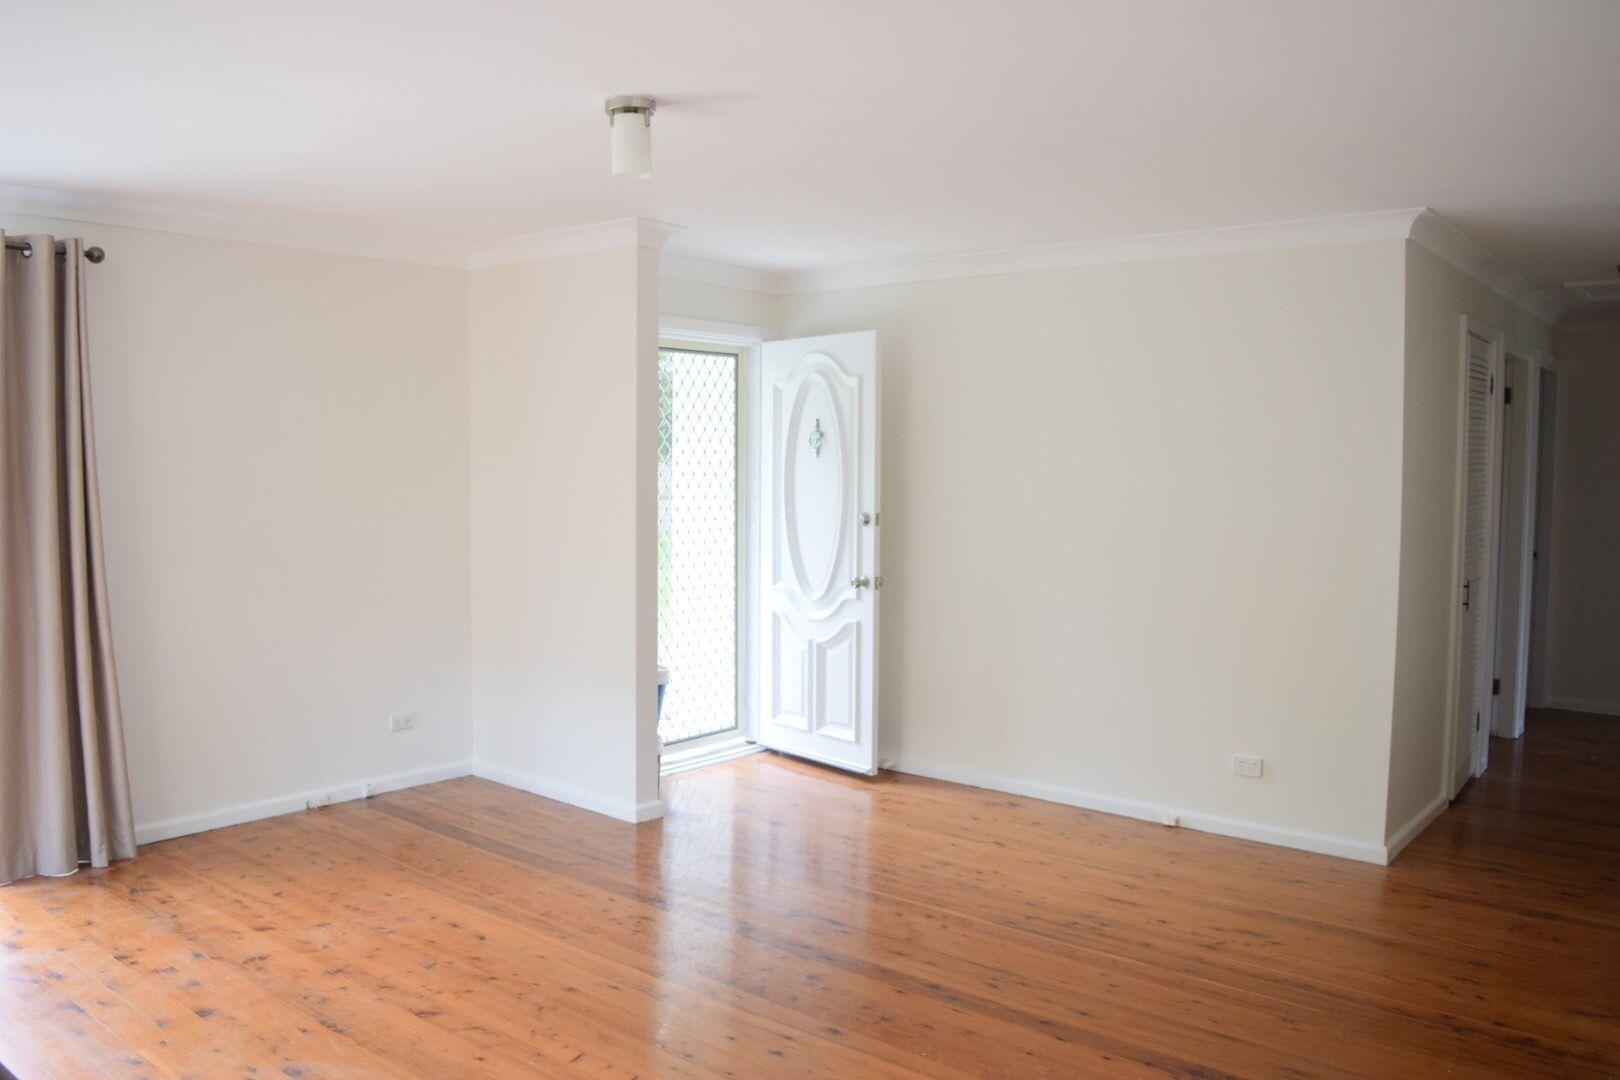 22 Acacia Avenue, Leura NSW 2780, Image 1